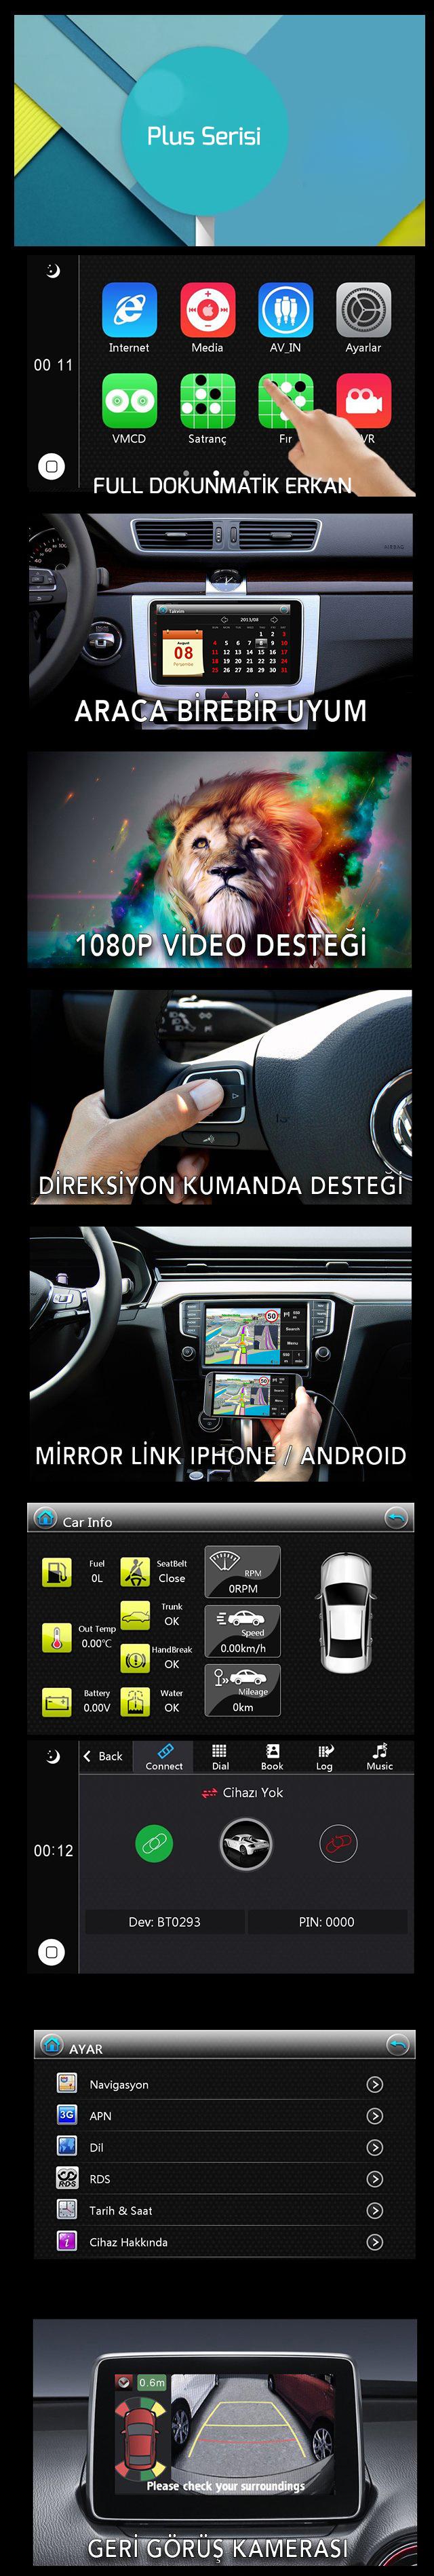 navimex navigasyon sistemleri